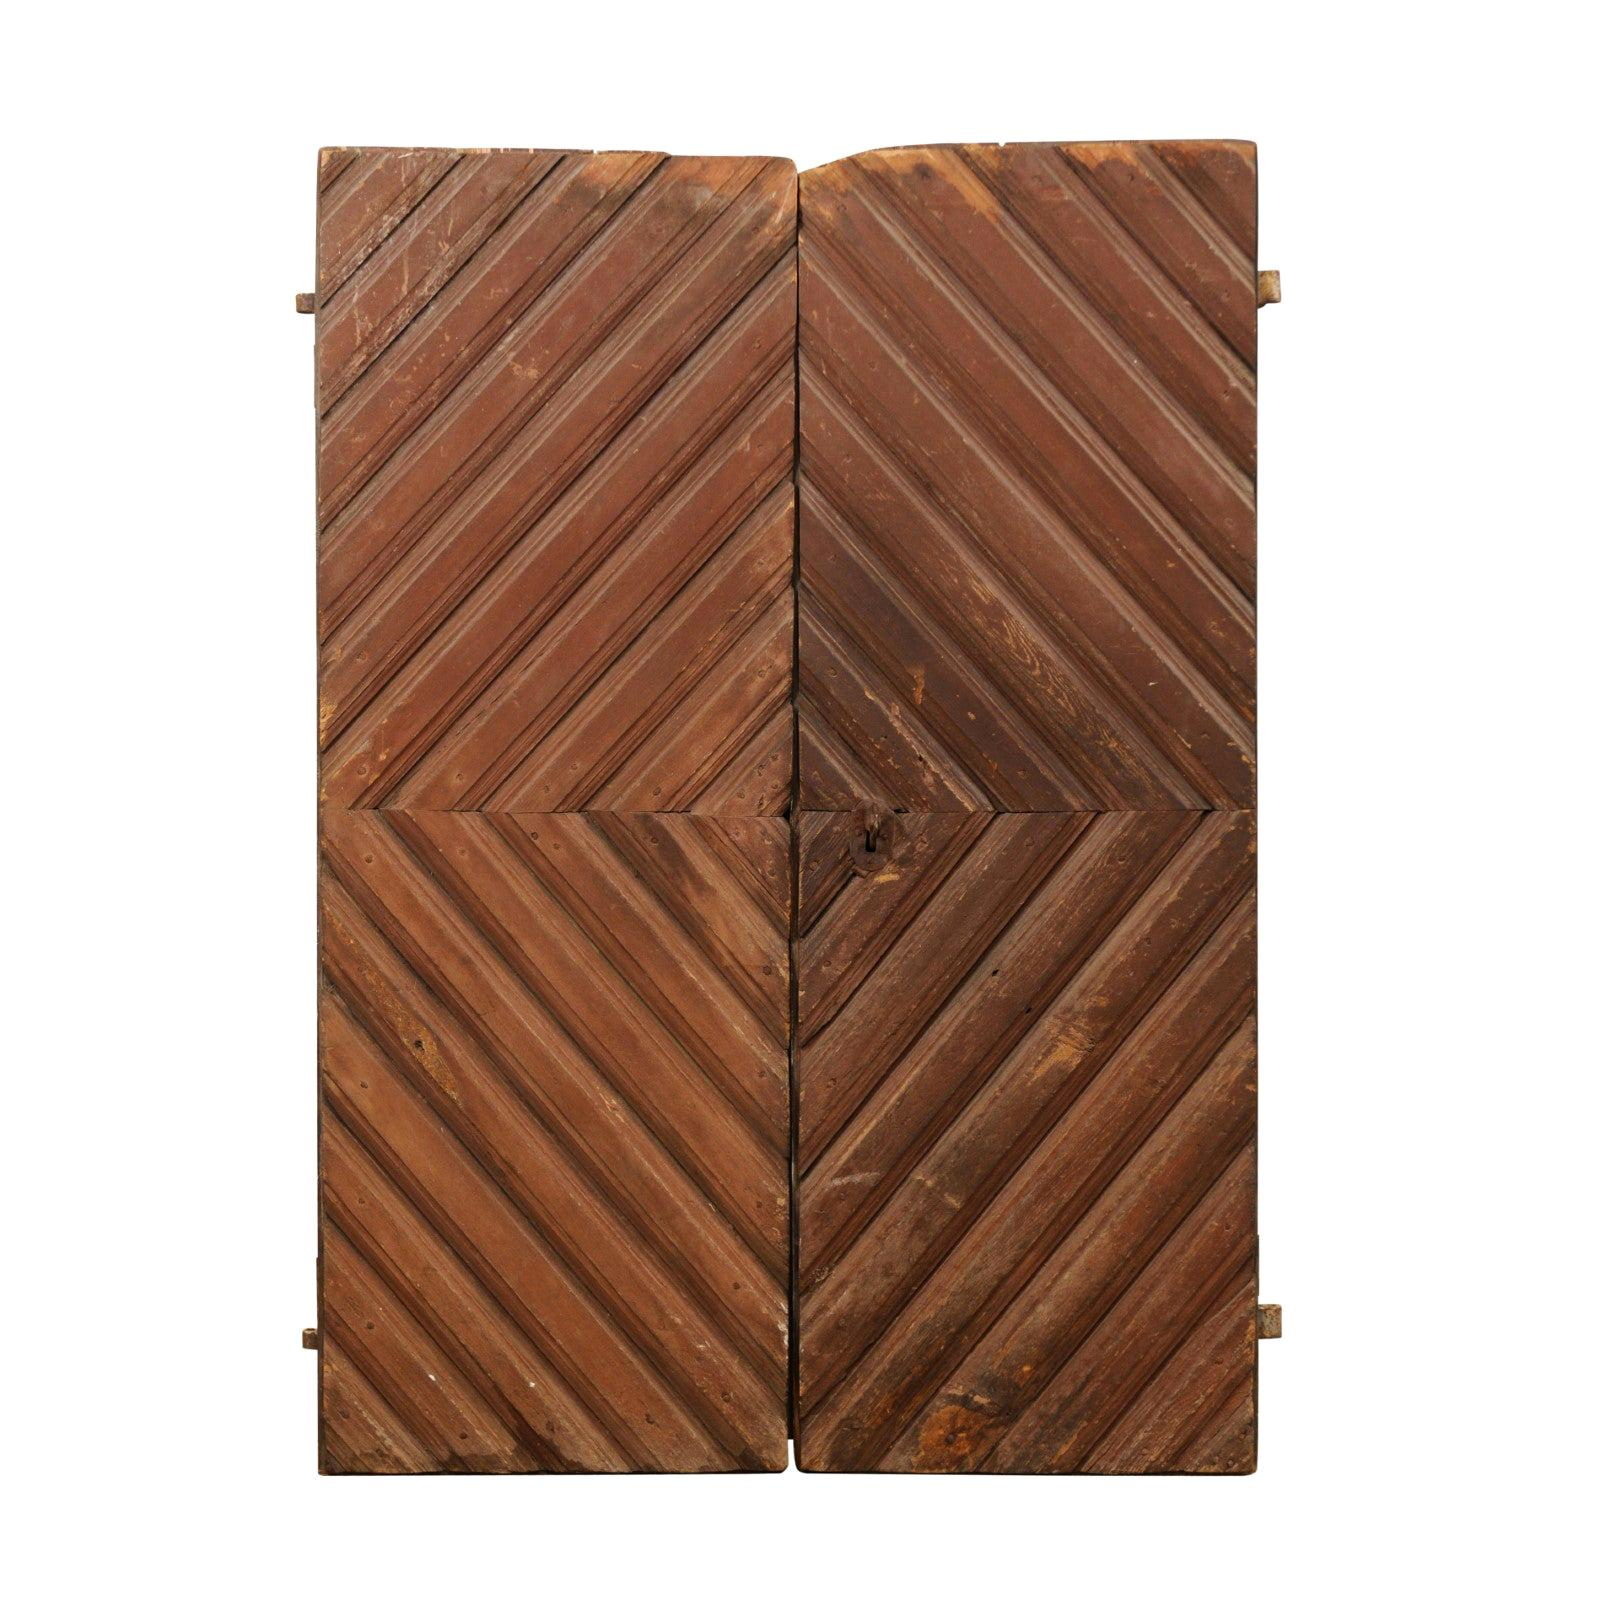 Pair of 19th Century Swedish Diamond Pattern Doors